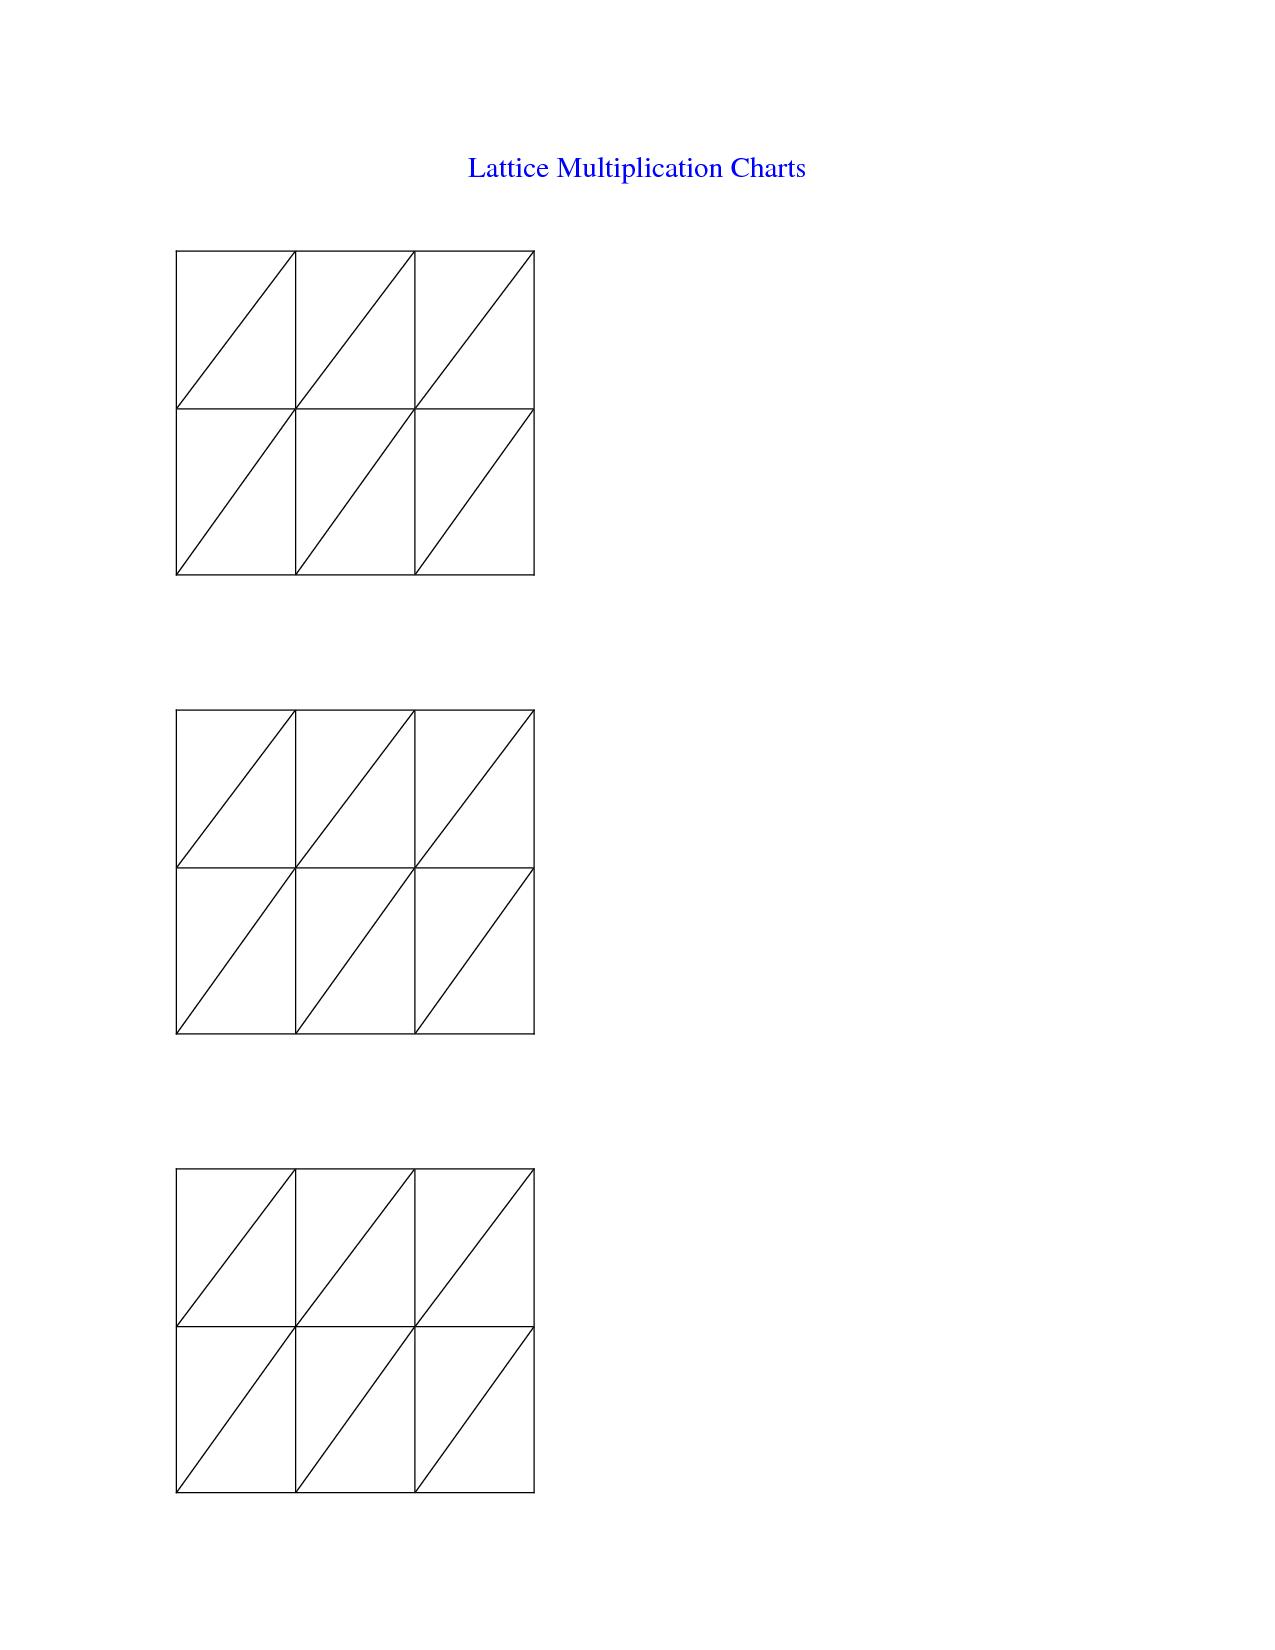 worksheet Lattice Multiplication Worksheet multiplying decimals lattice worksheet multiplication how to do lattice